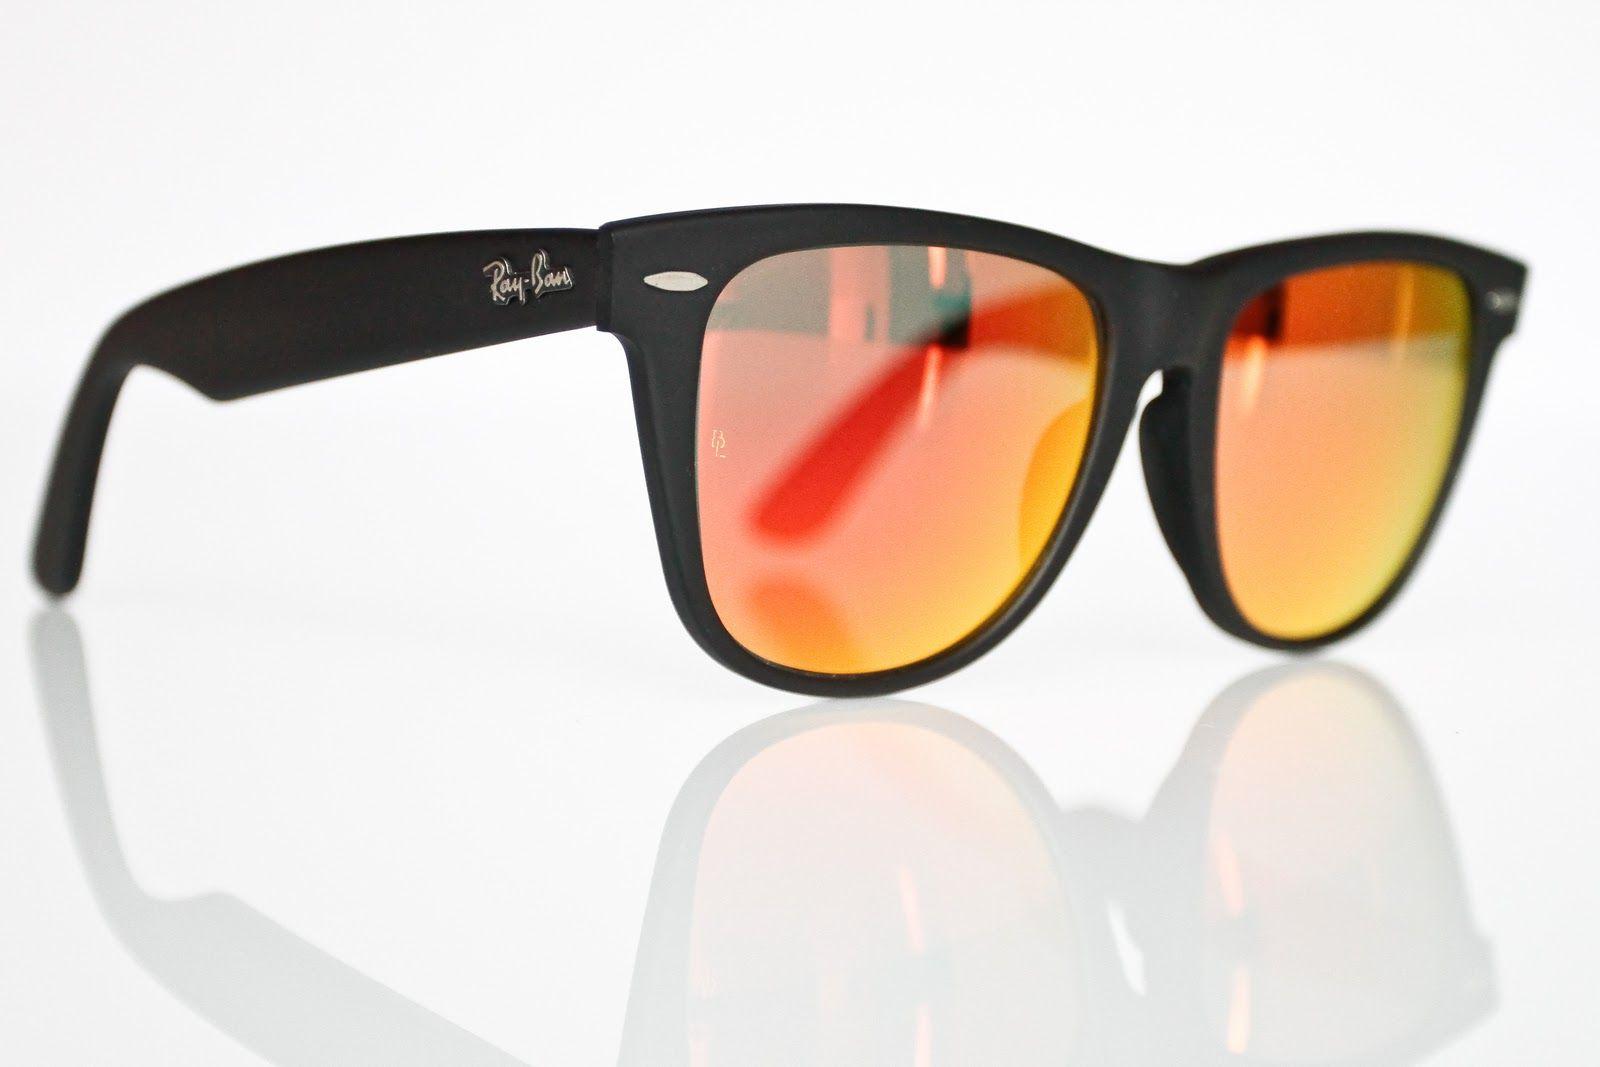 ray ban wayfarer mirrored lenses